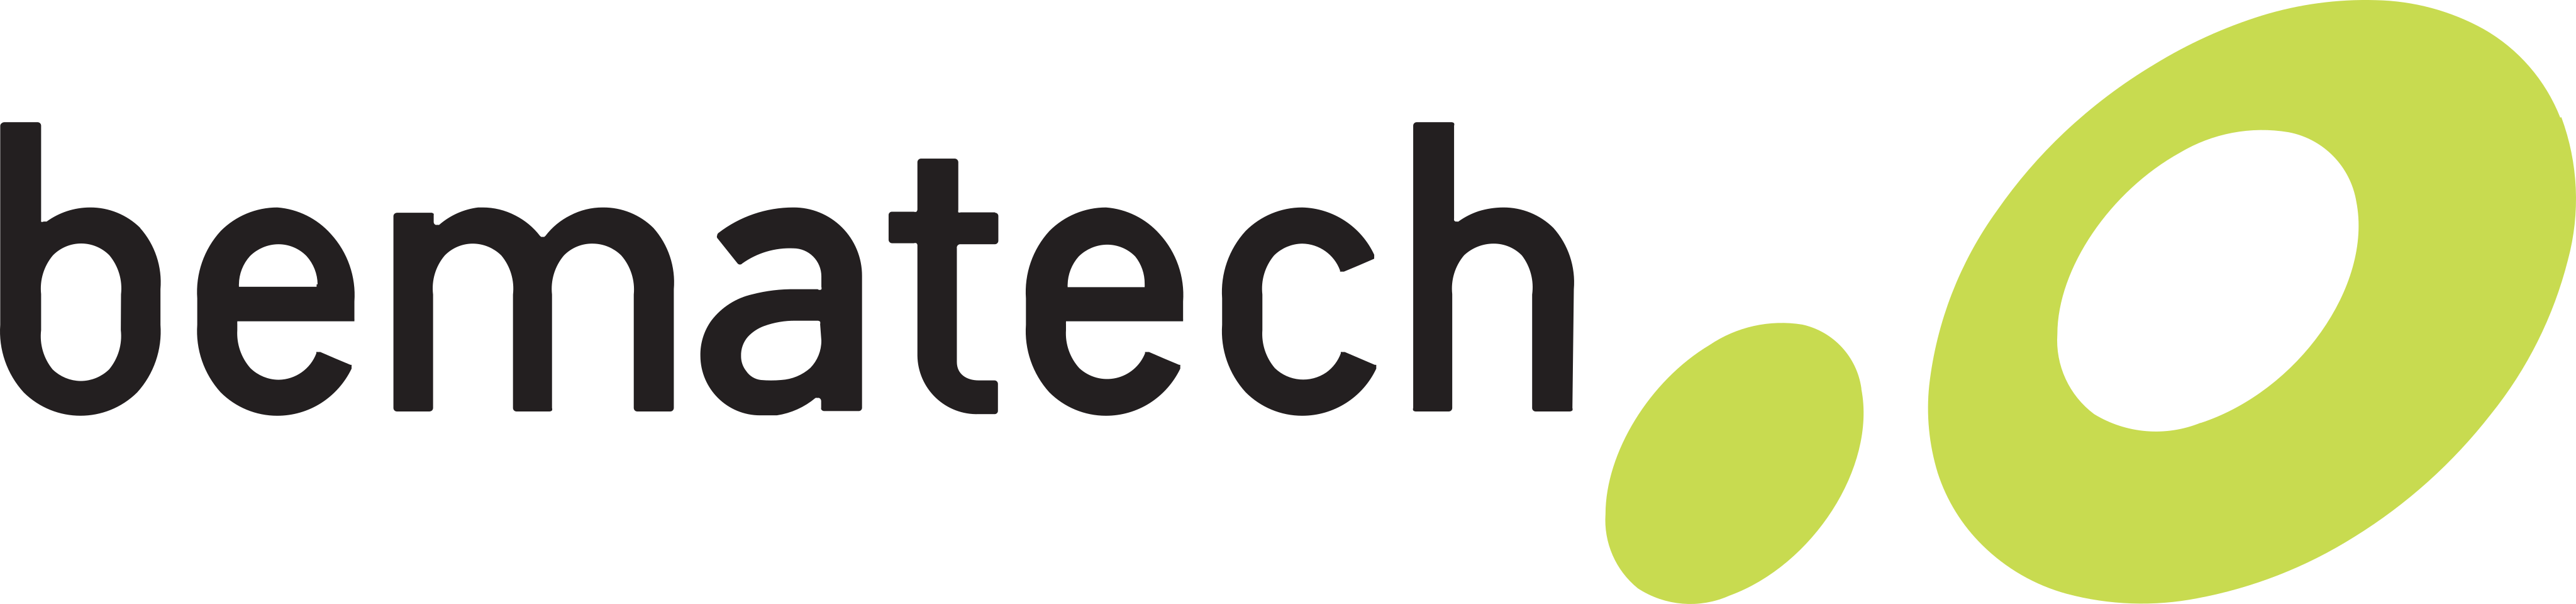 Bematech Logo.